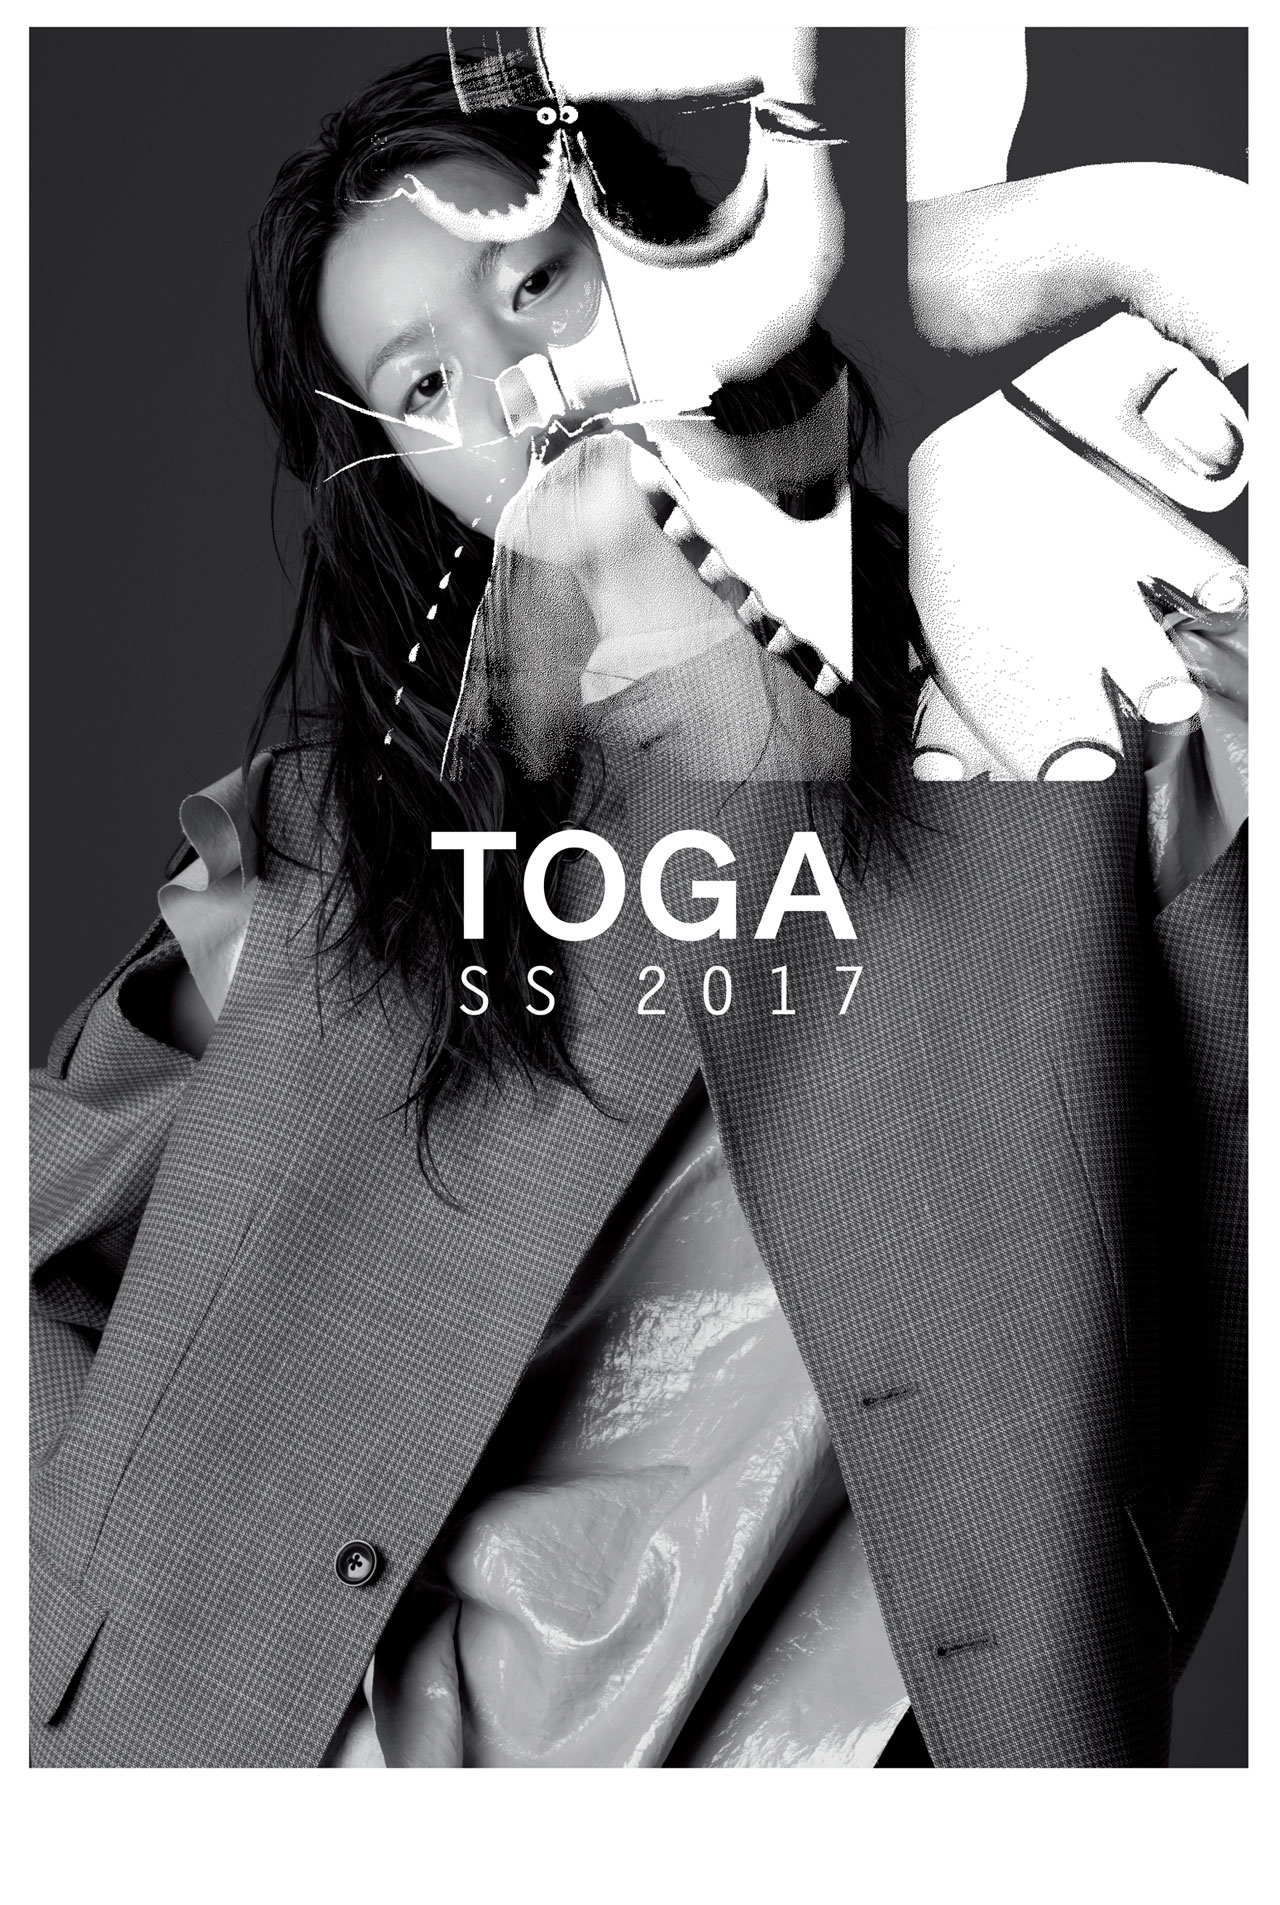 @ TOGA